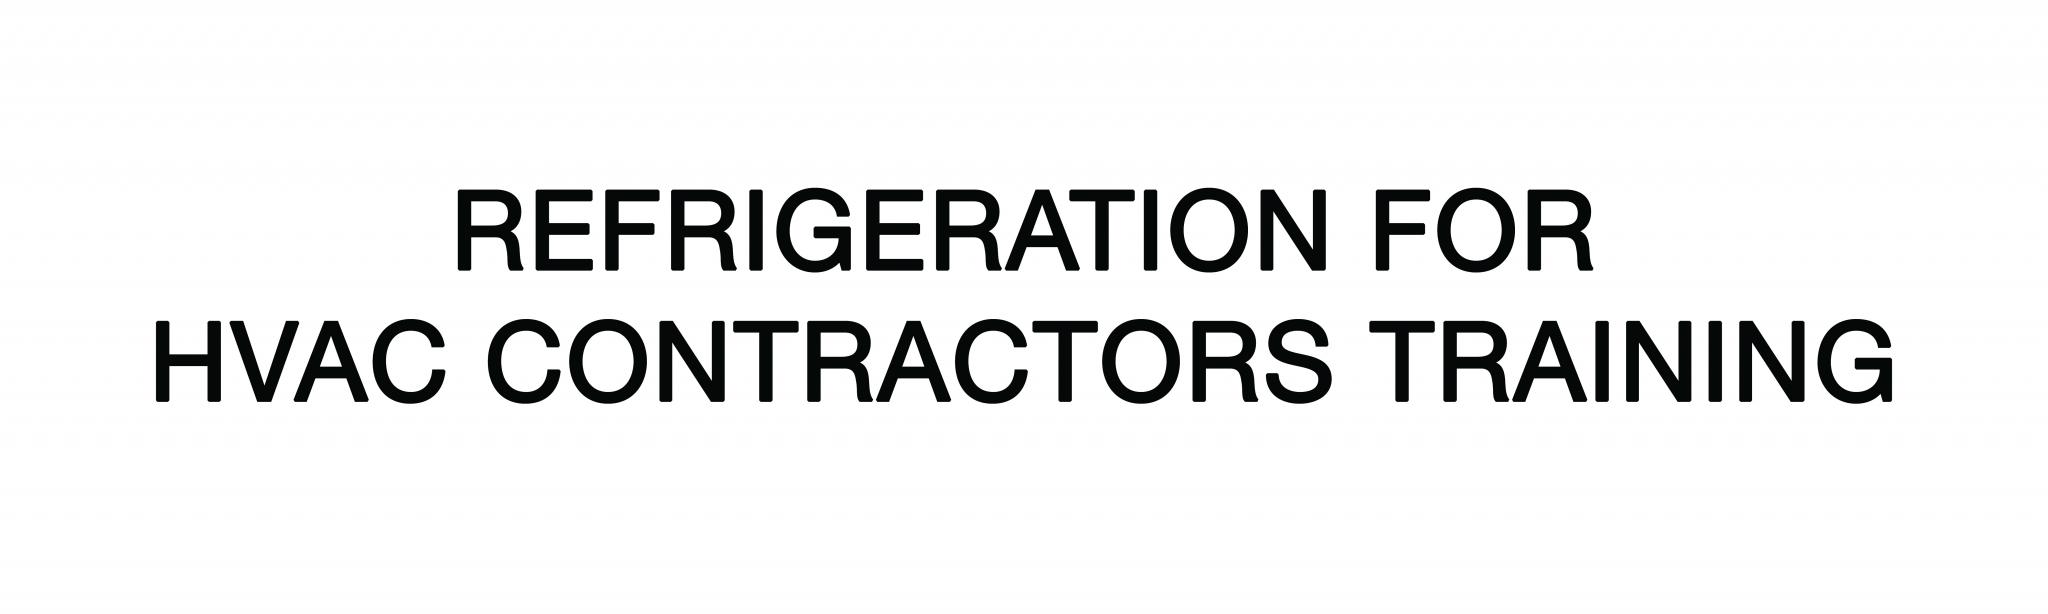 Refrigeration for HVAC Contractors Training - Omaha